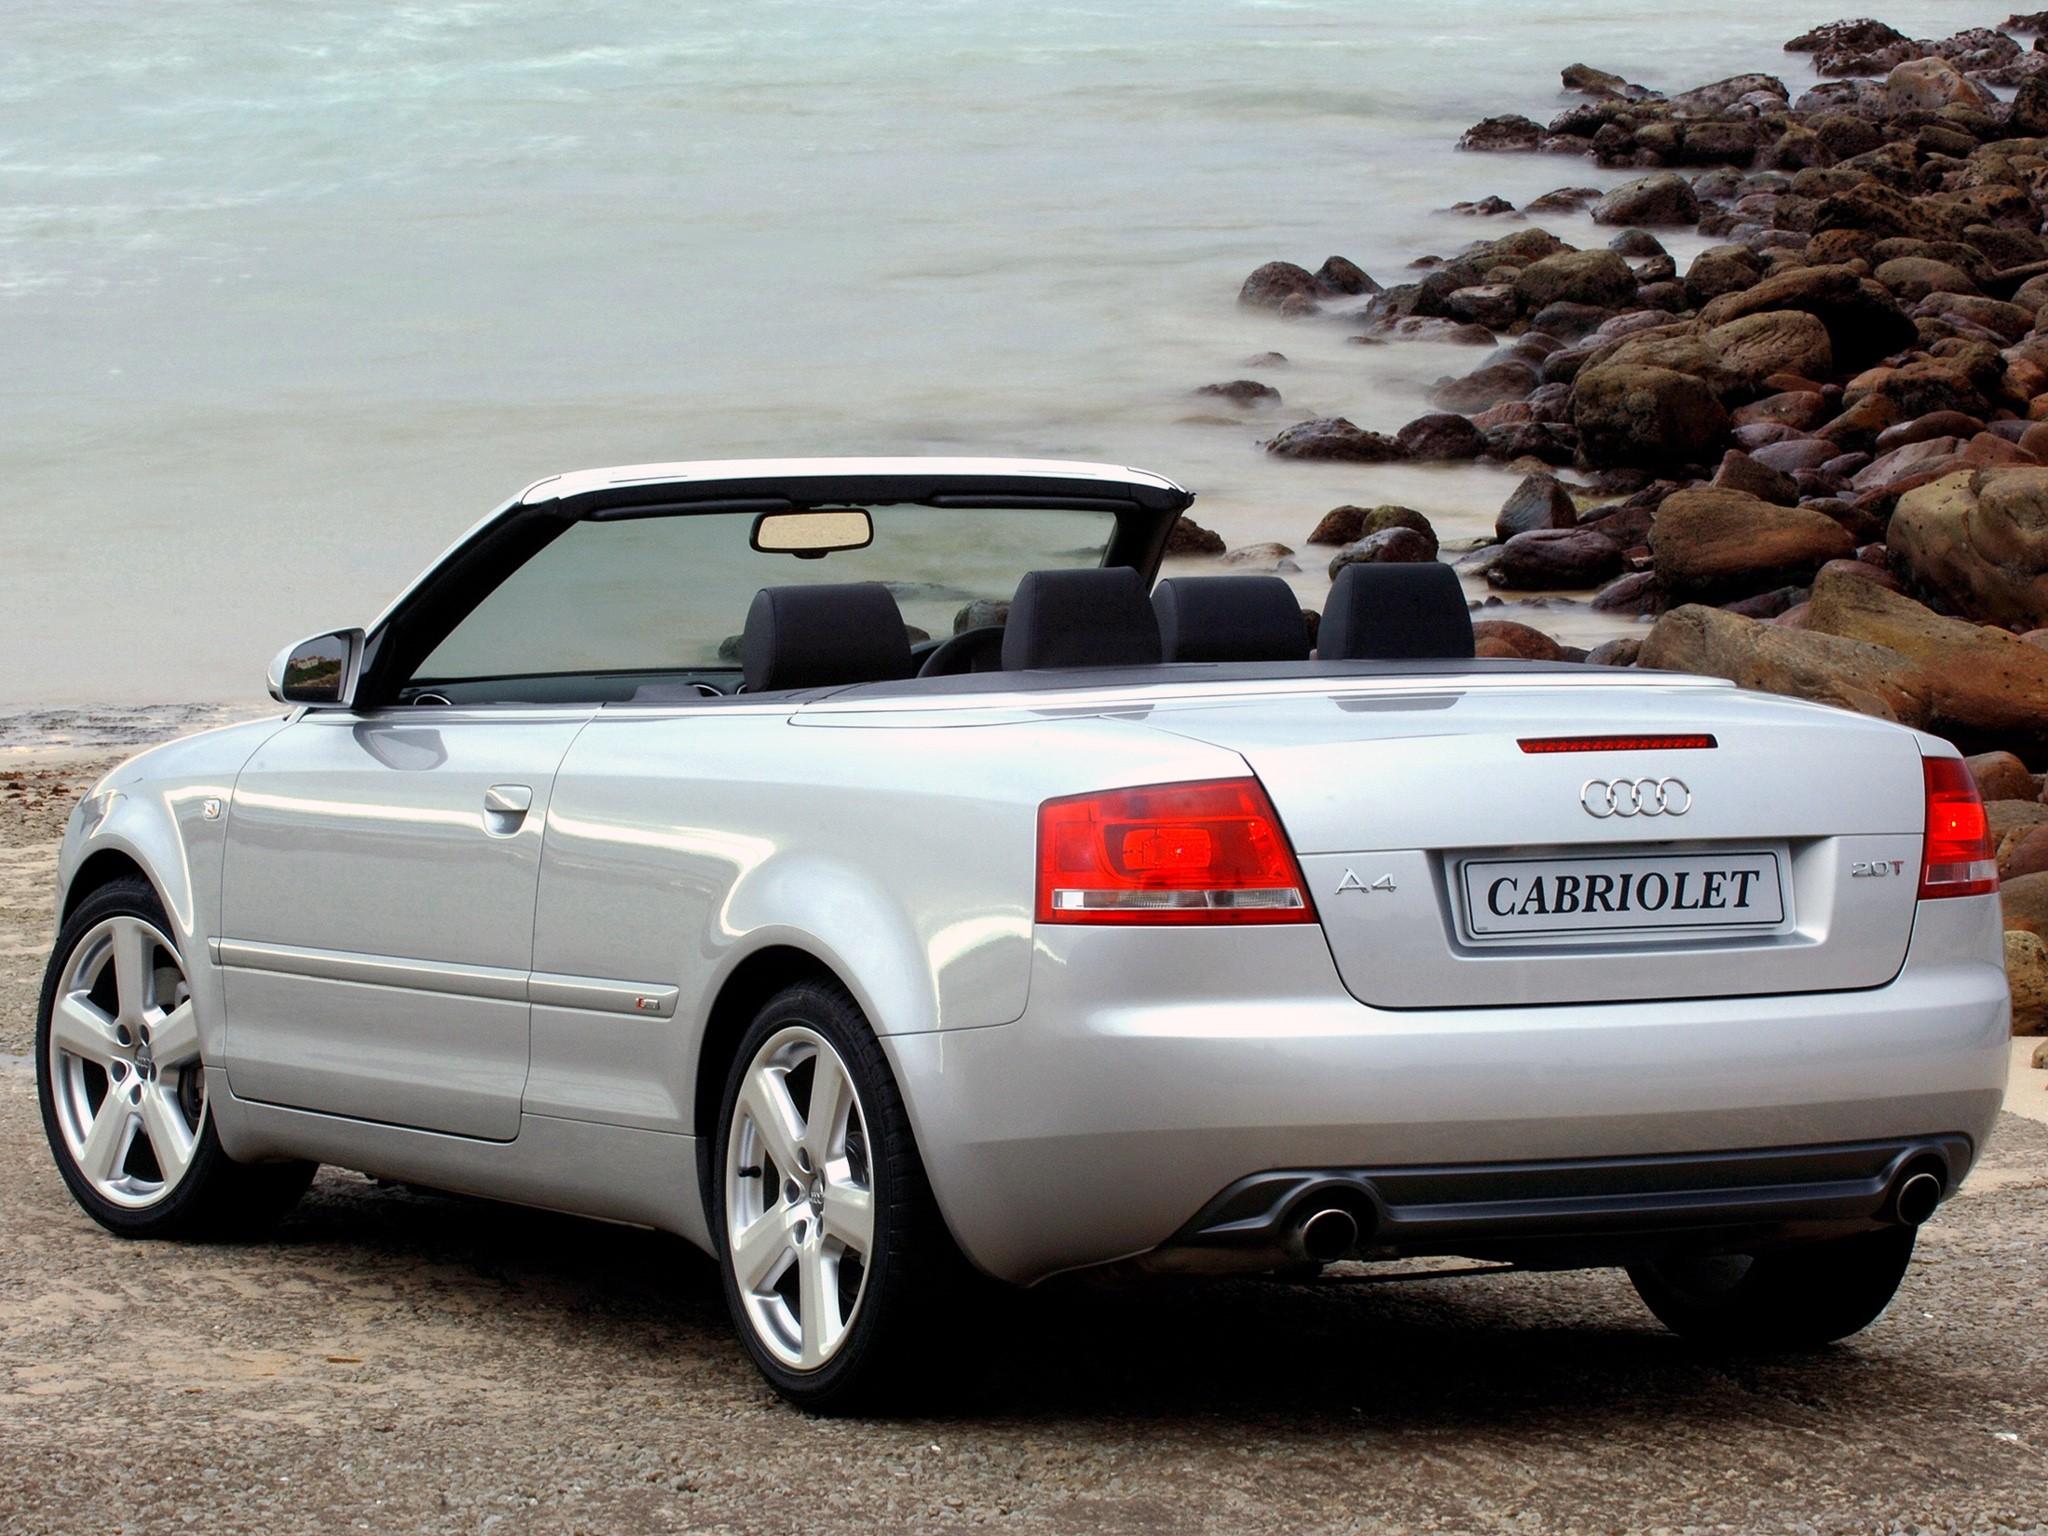 Audi A4 III (B7) 2004 - 2008 Cabriolet #6